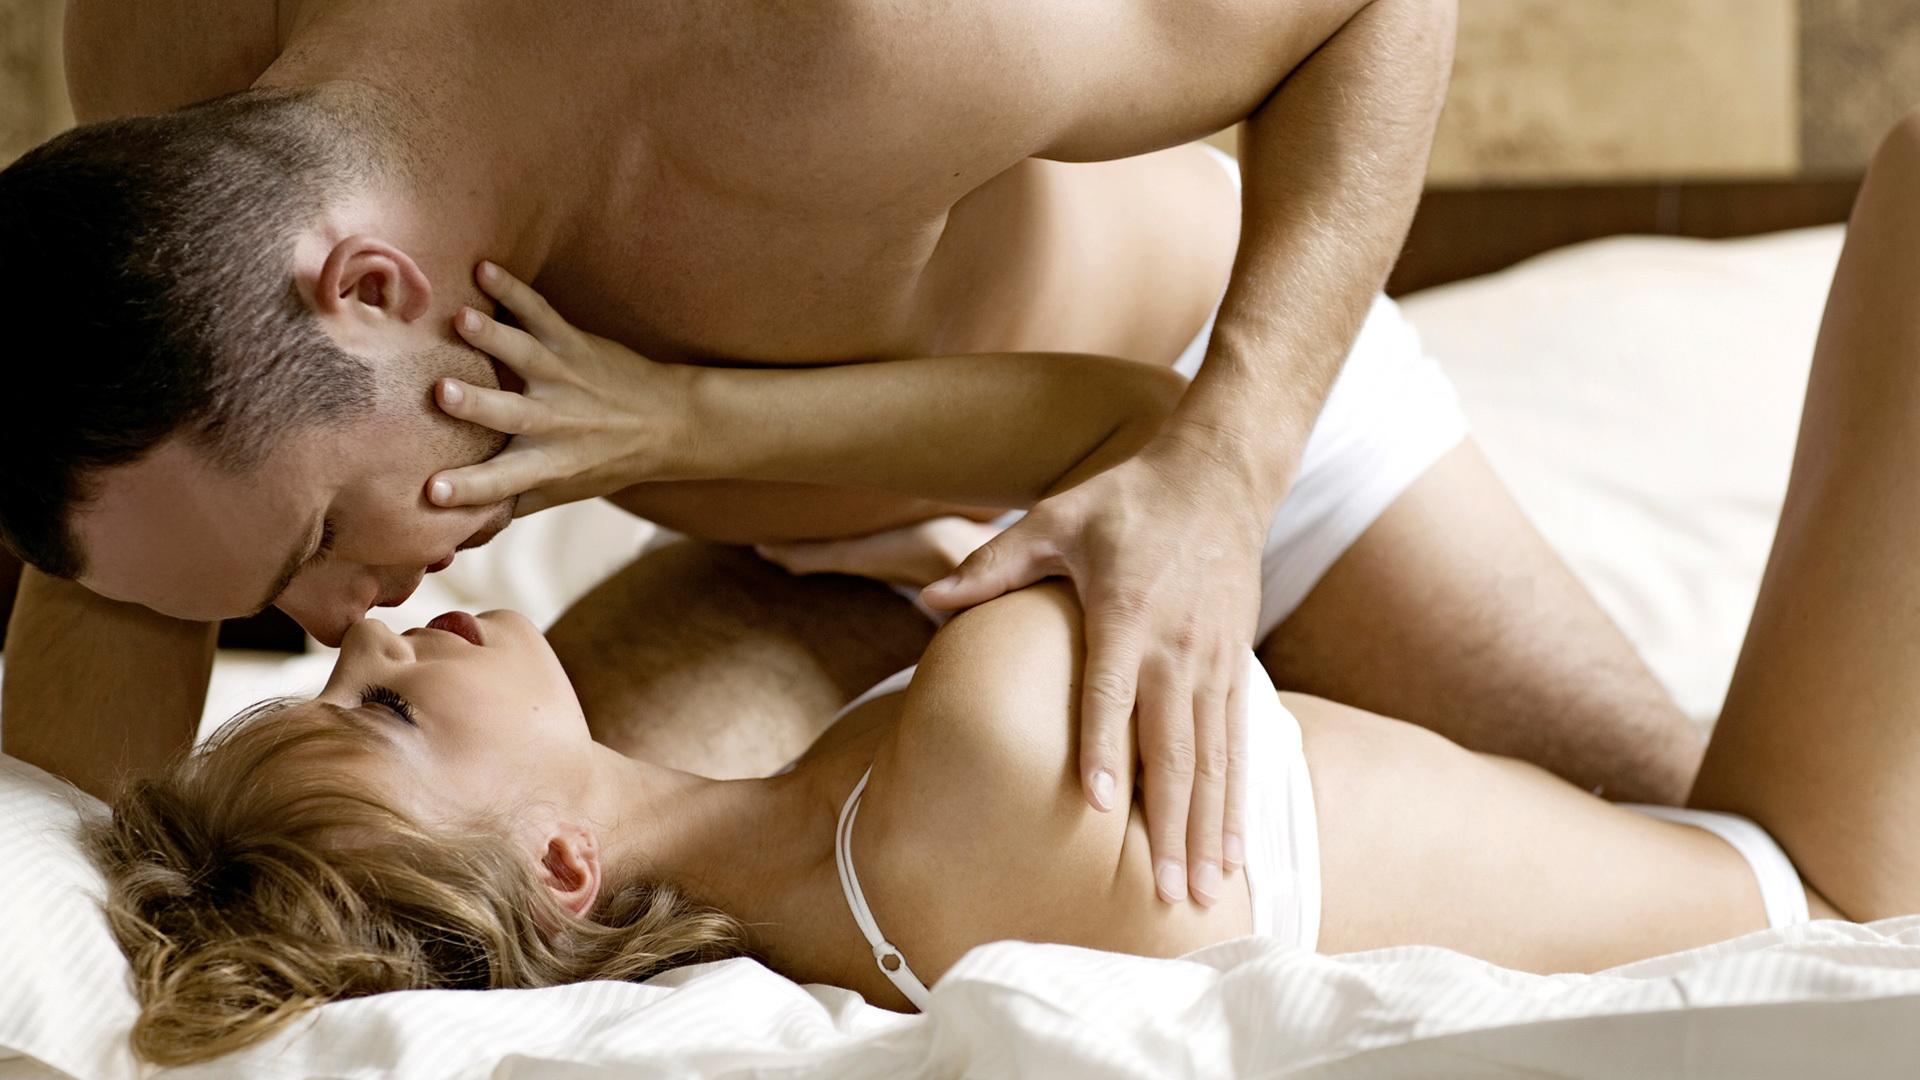 видео пособие про секс хентай